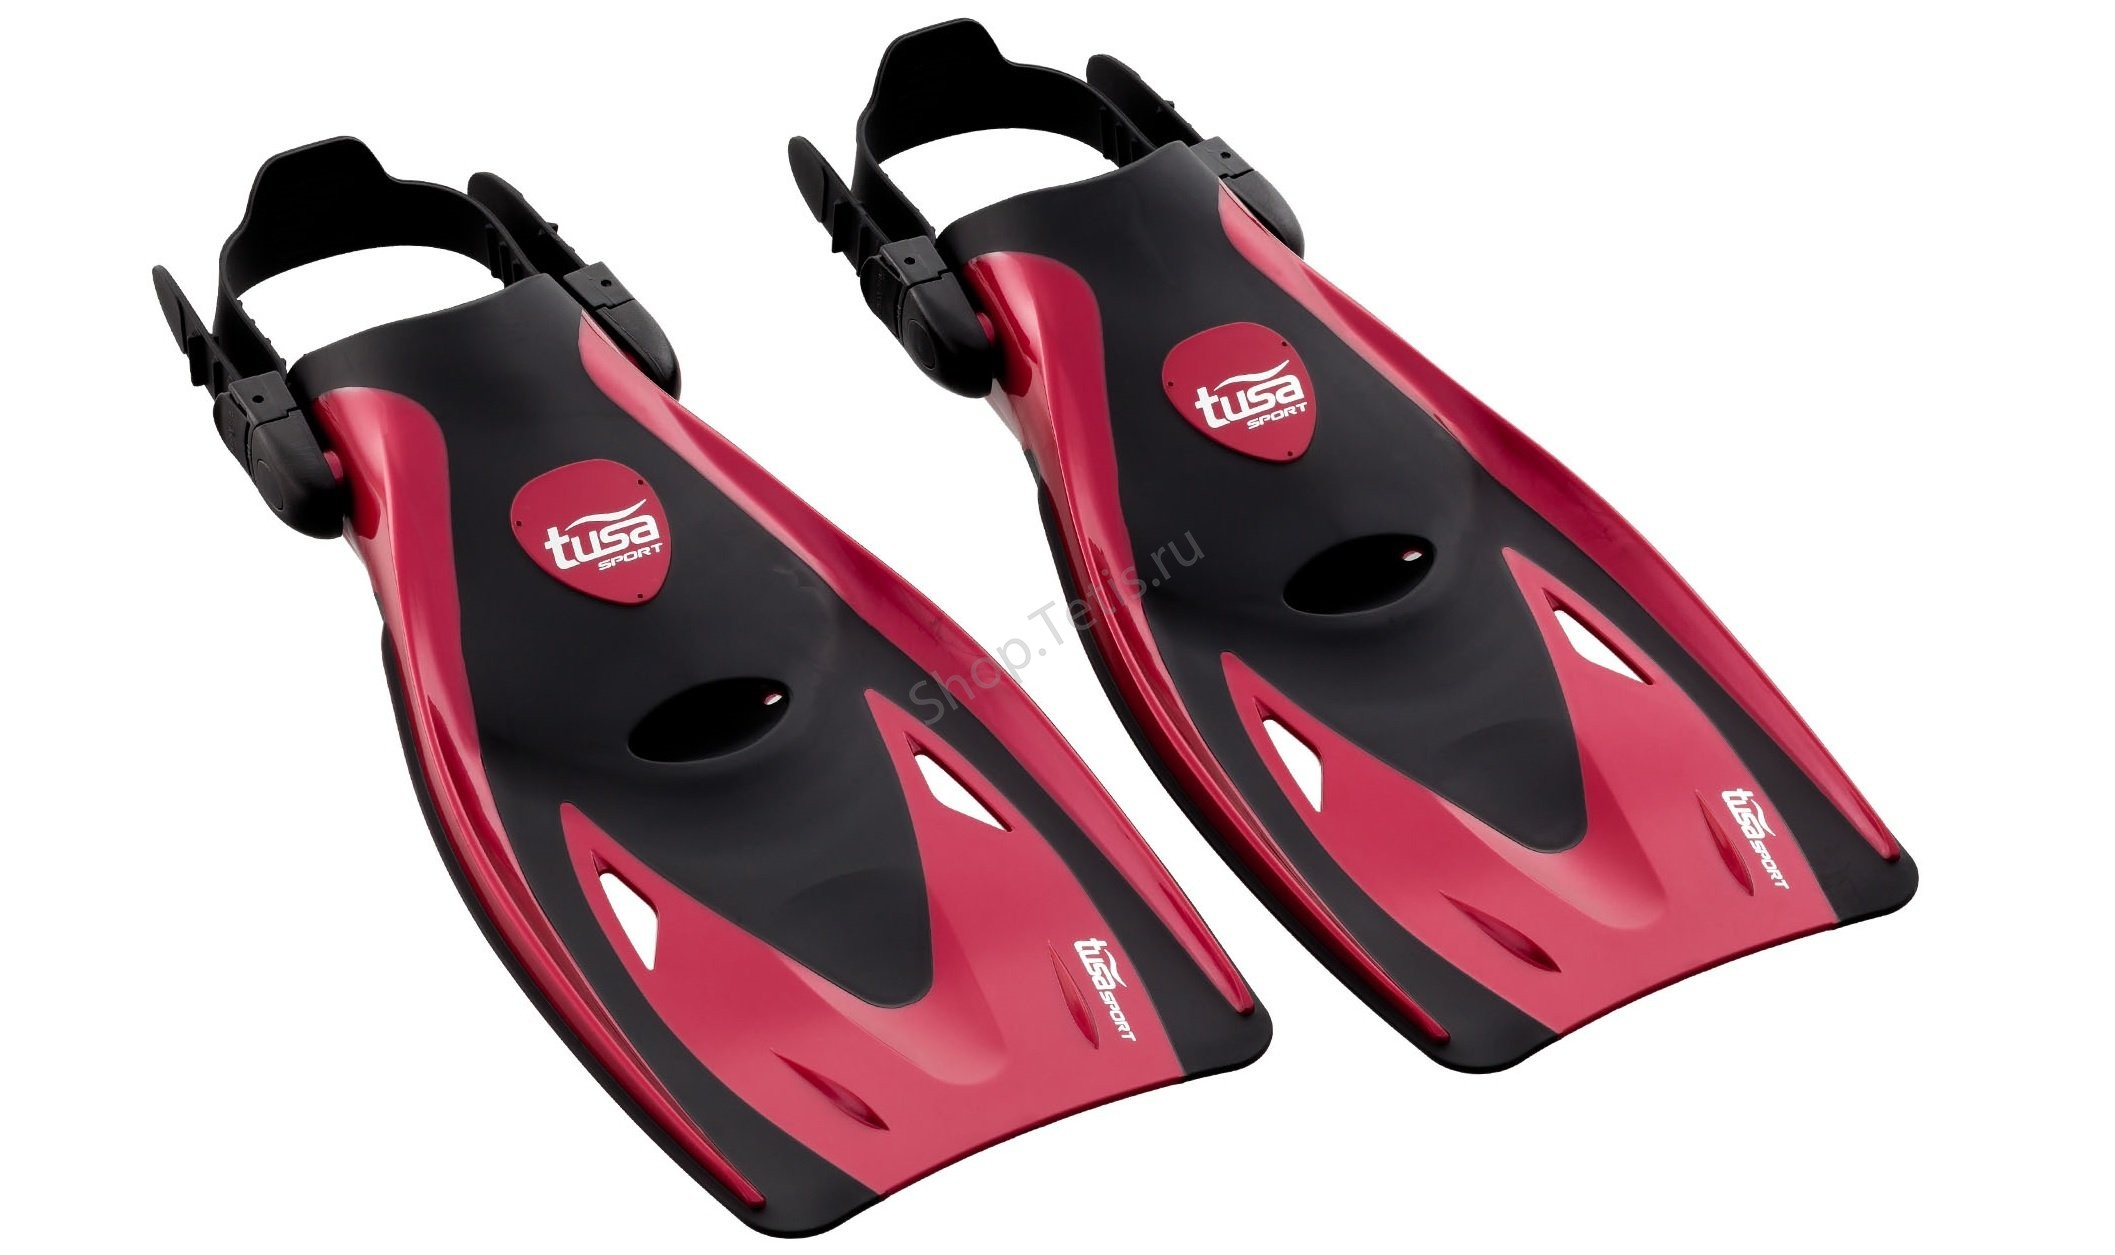 Ласты короткие для плавания Tusa Sport Black Series